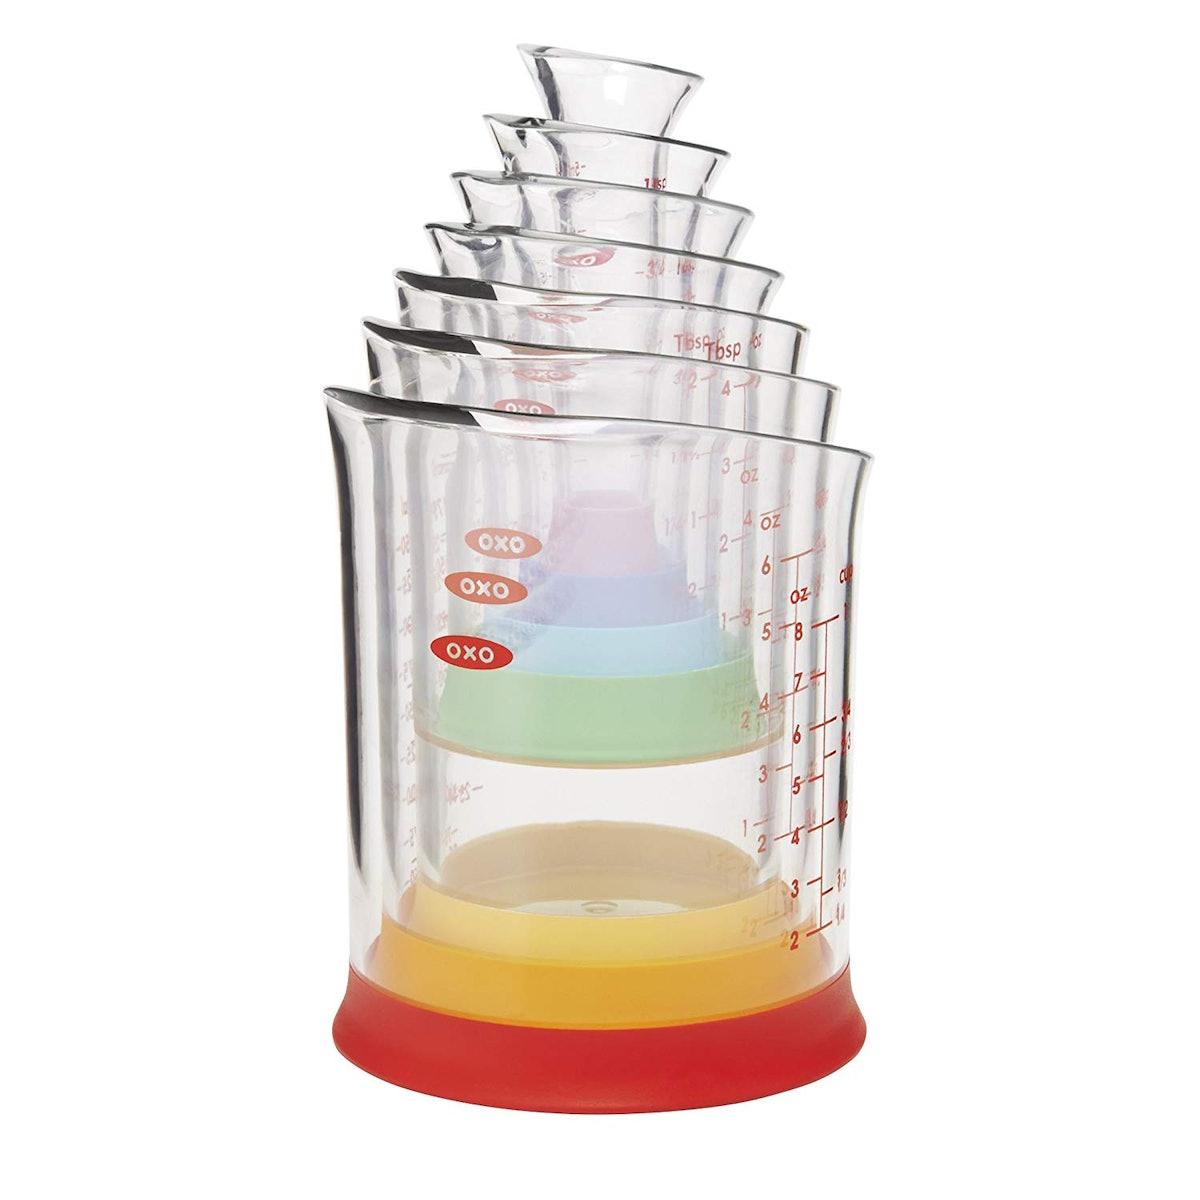 OXO Nesting Measurement Beakers (7-Piece Set)